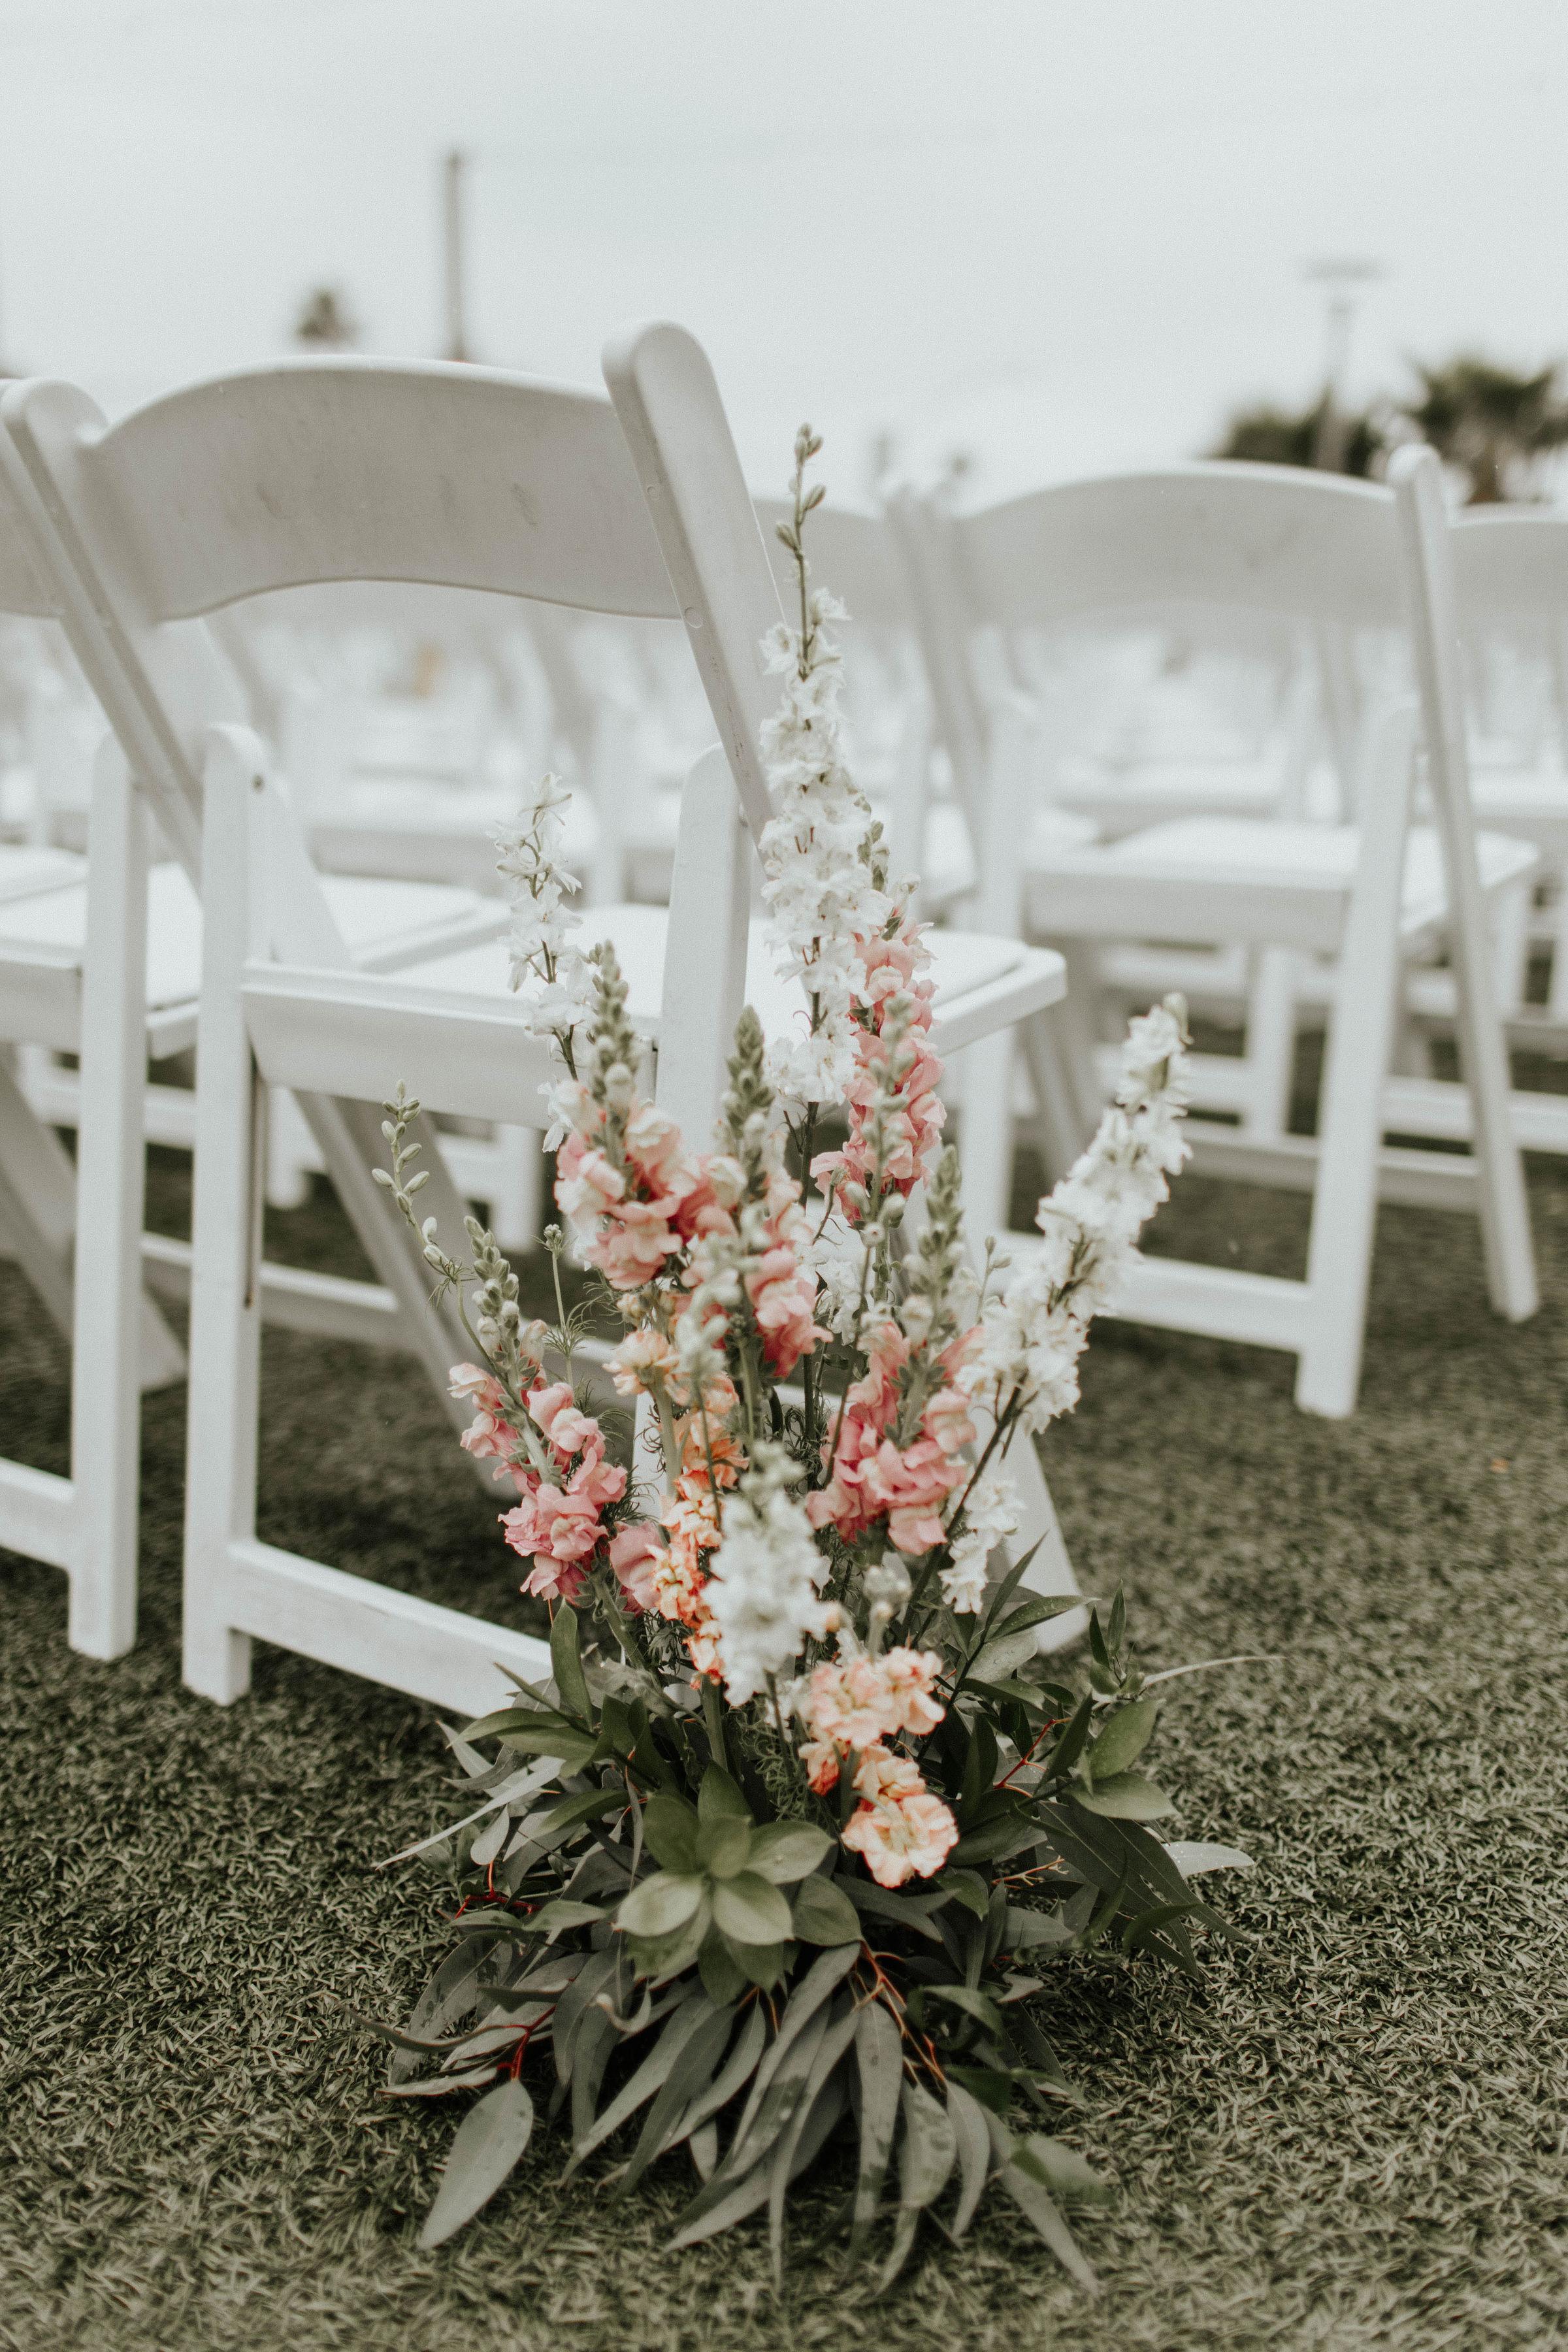 Living_Coral_Flowers_Sibyl_Sophia_Des_Moines_Iowa.jpg